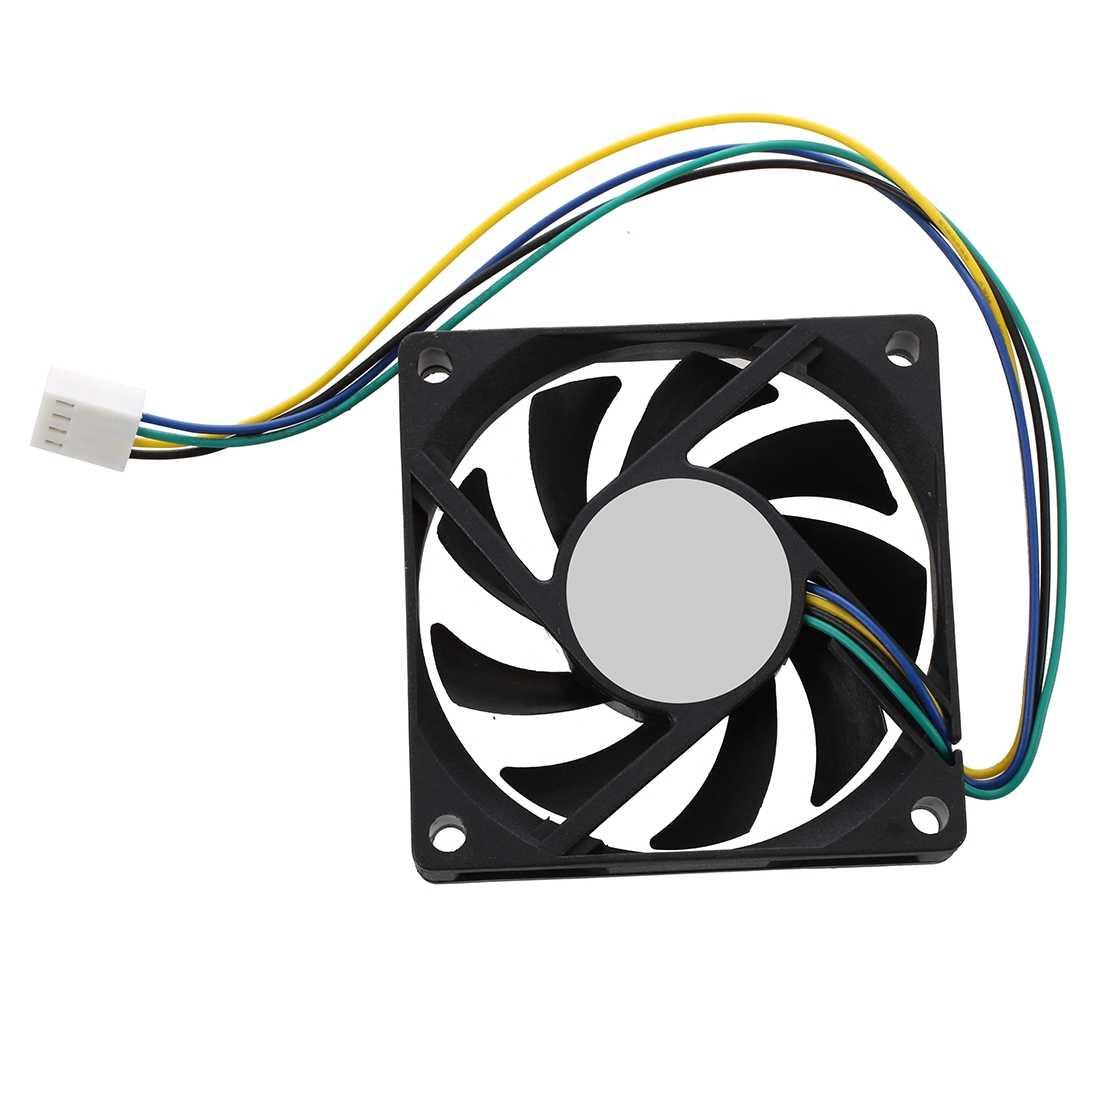 70X70X15Mm 12V 4 Pins PWMคอมพิวเตอร์Caseพัดลมระบายความร้อนพัดลมระบายความร้อนสีดำ